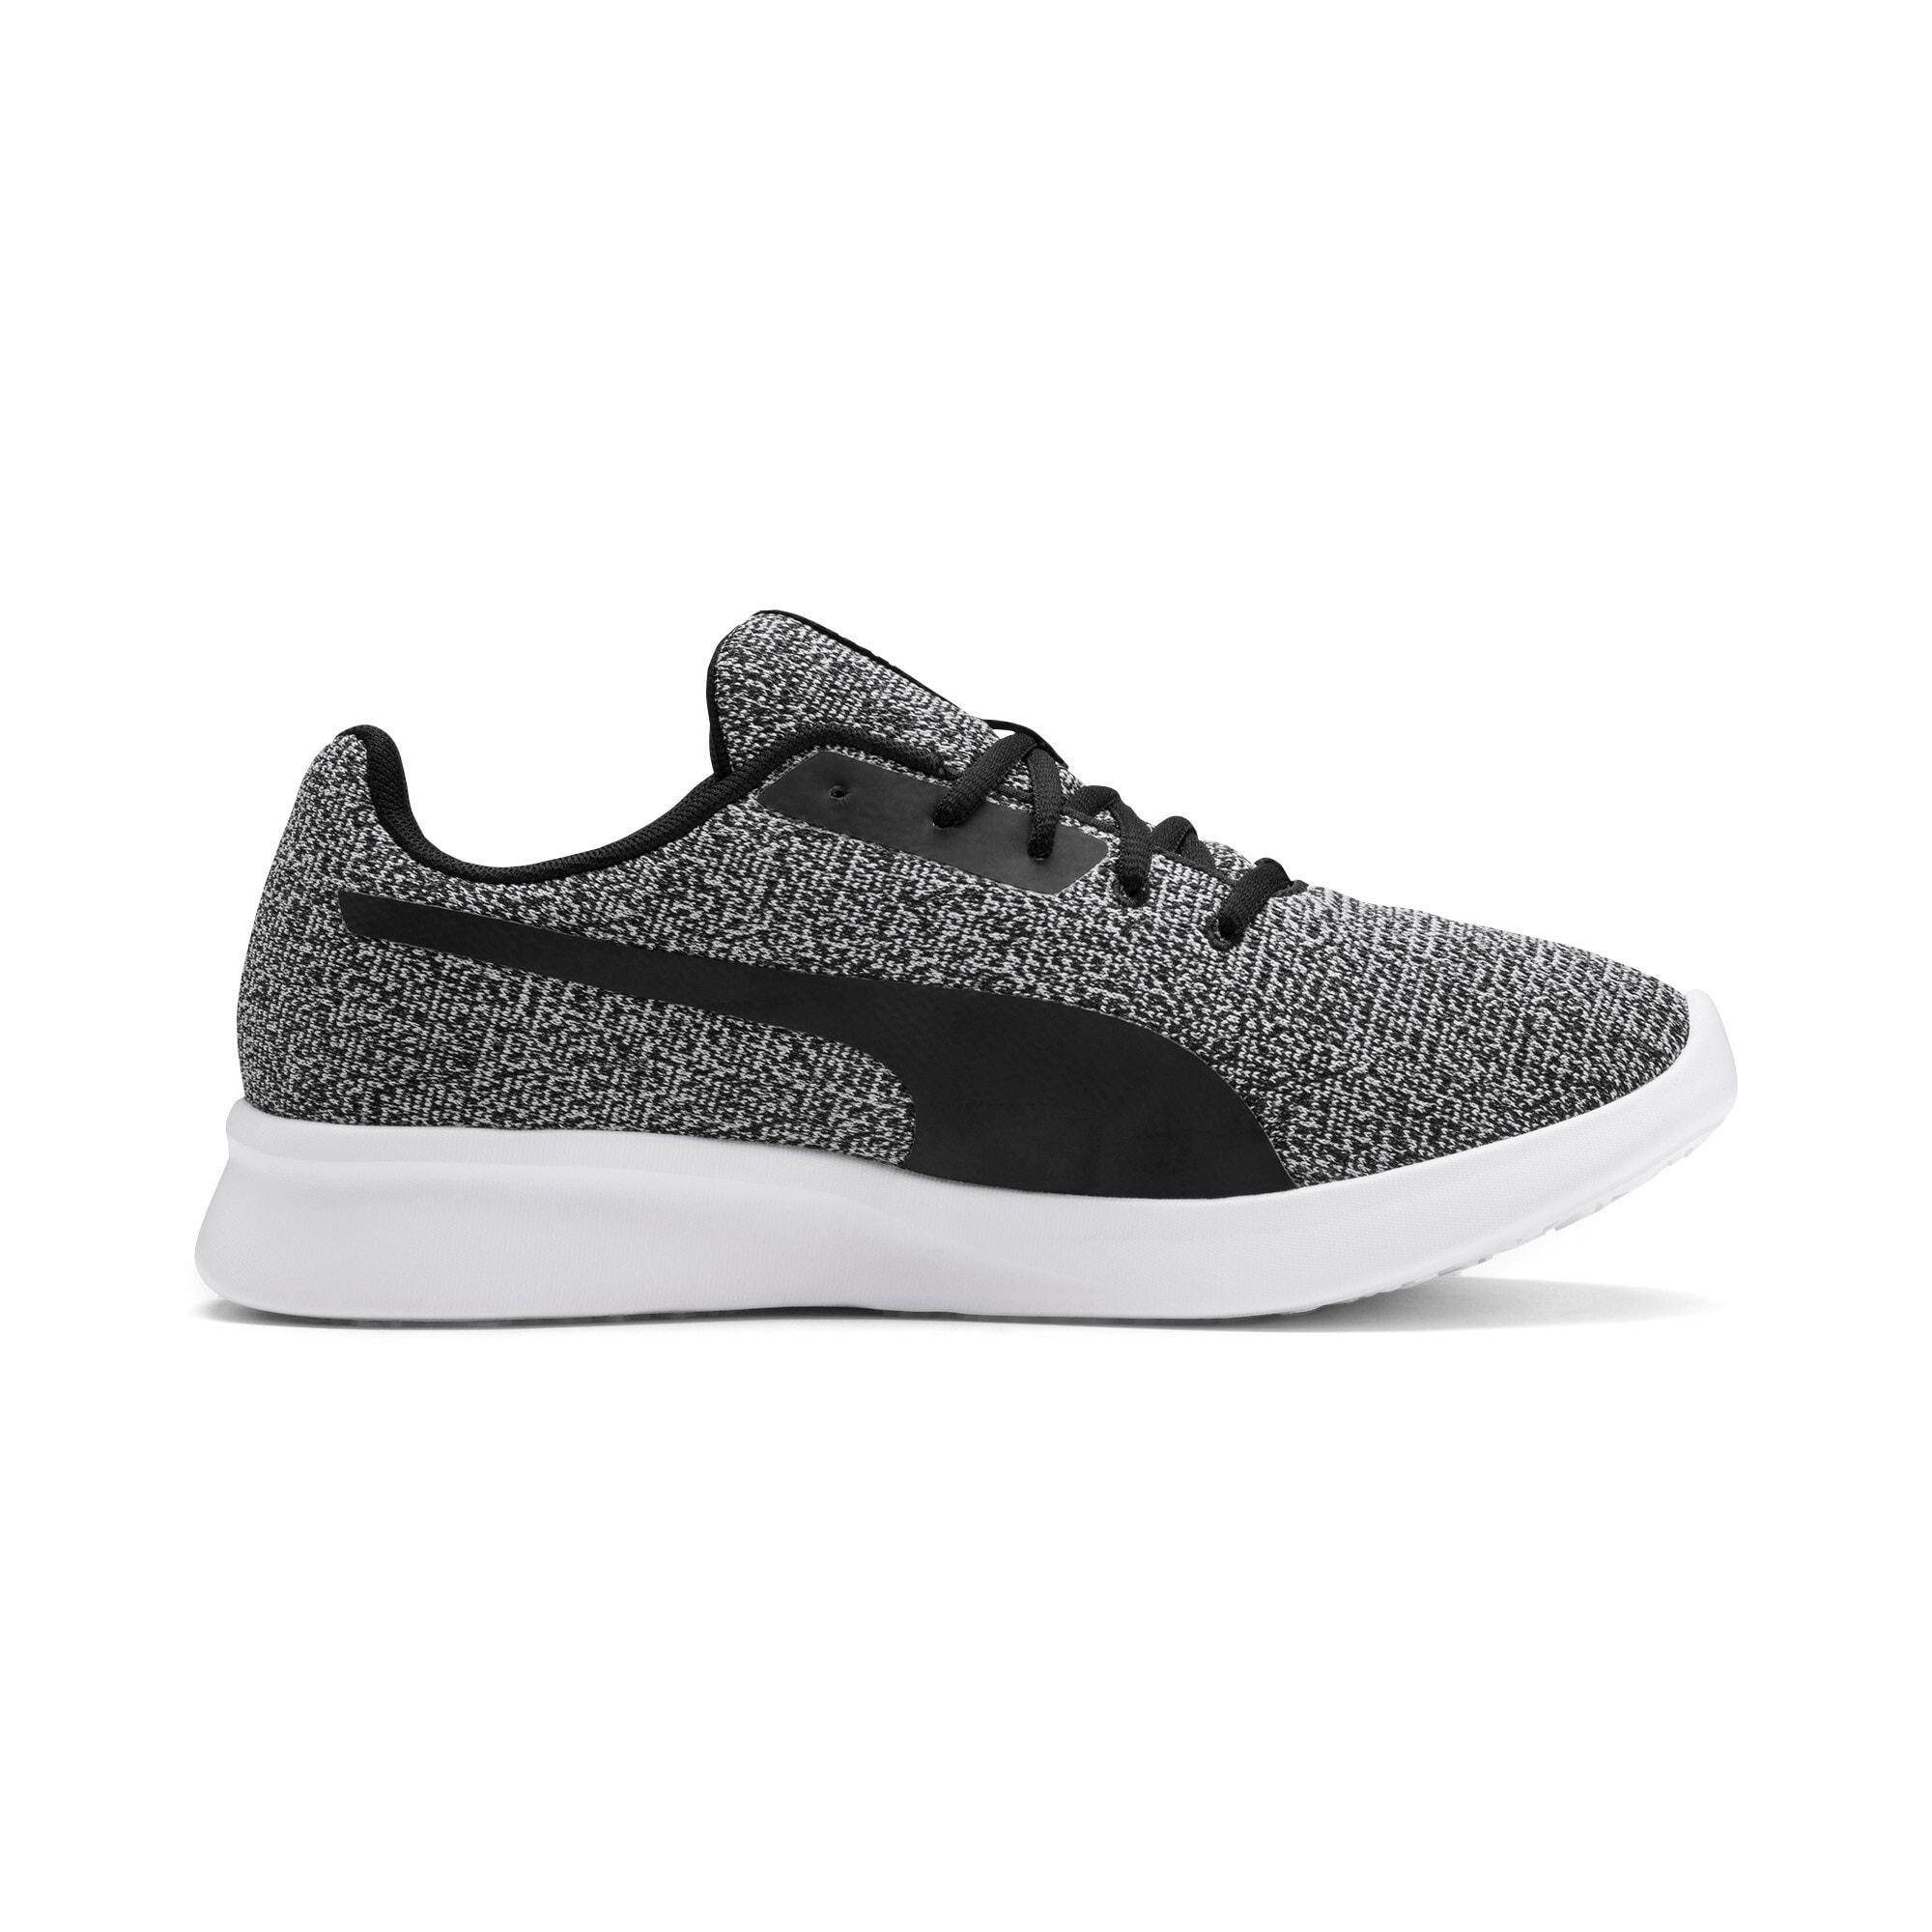 Thumbnail 7 of Modern Runner Sneakers, Gray Violet-Puma Black, medium-IND